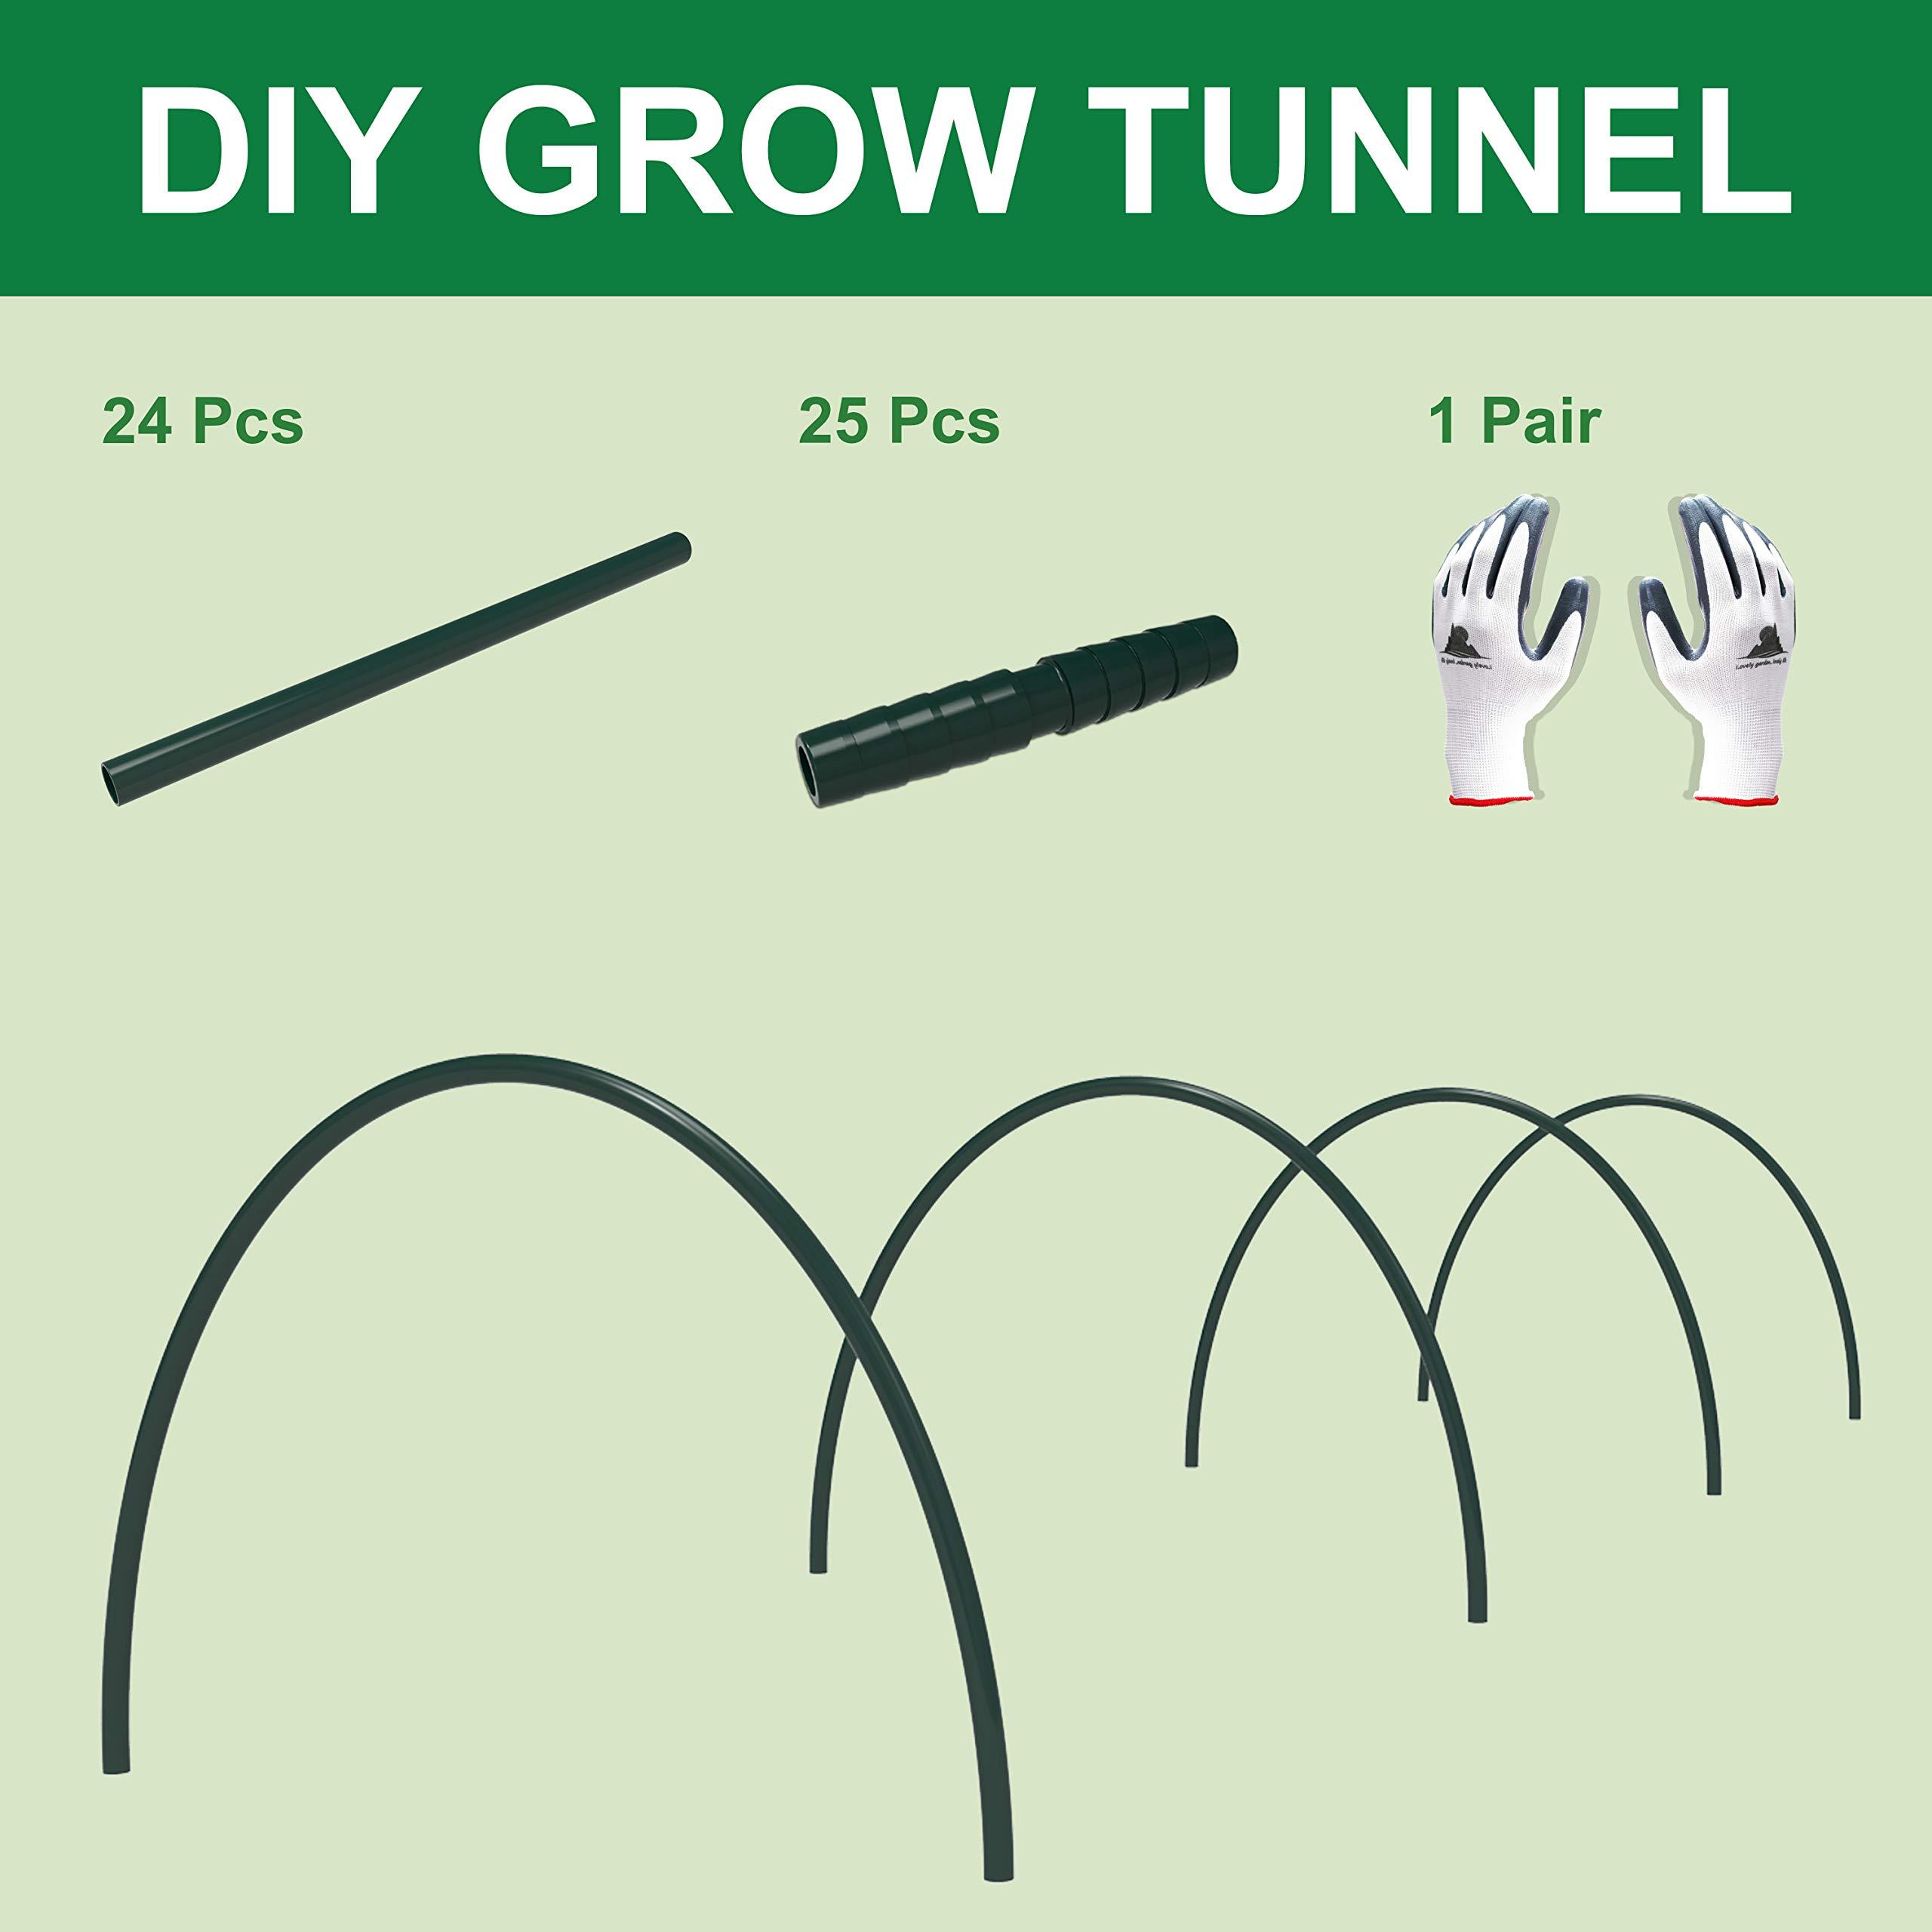 Gardzen DIY Hoops Grow Tunnel Mini Greenhouse, Garden Support Frame